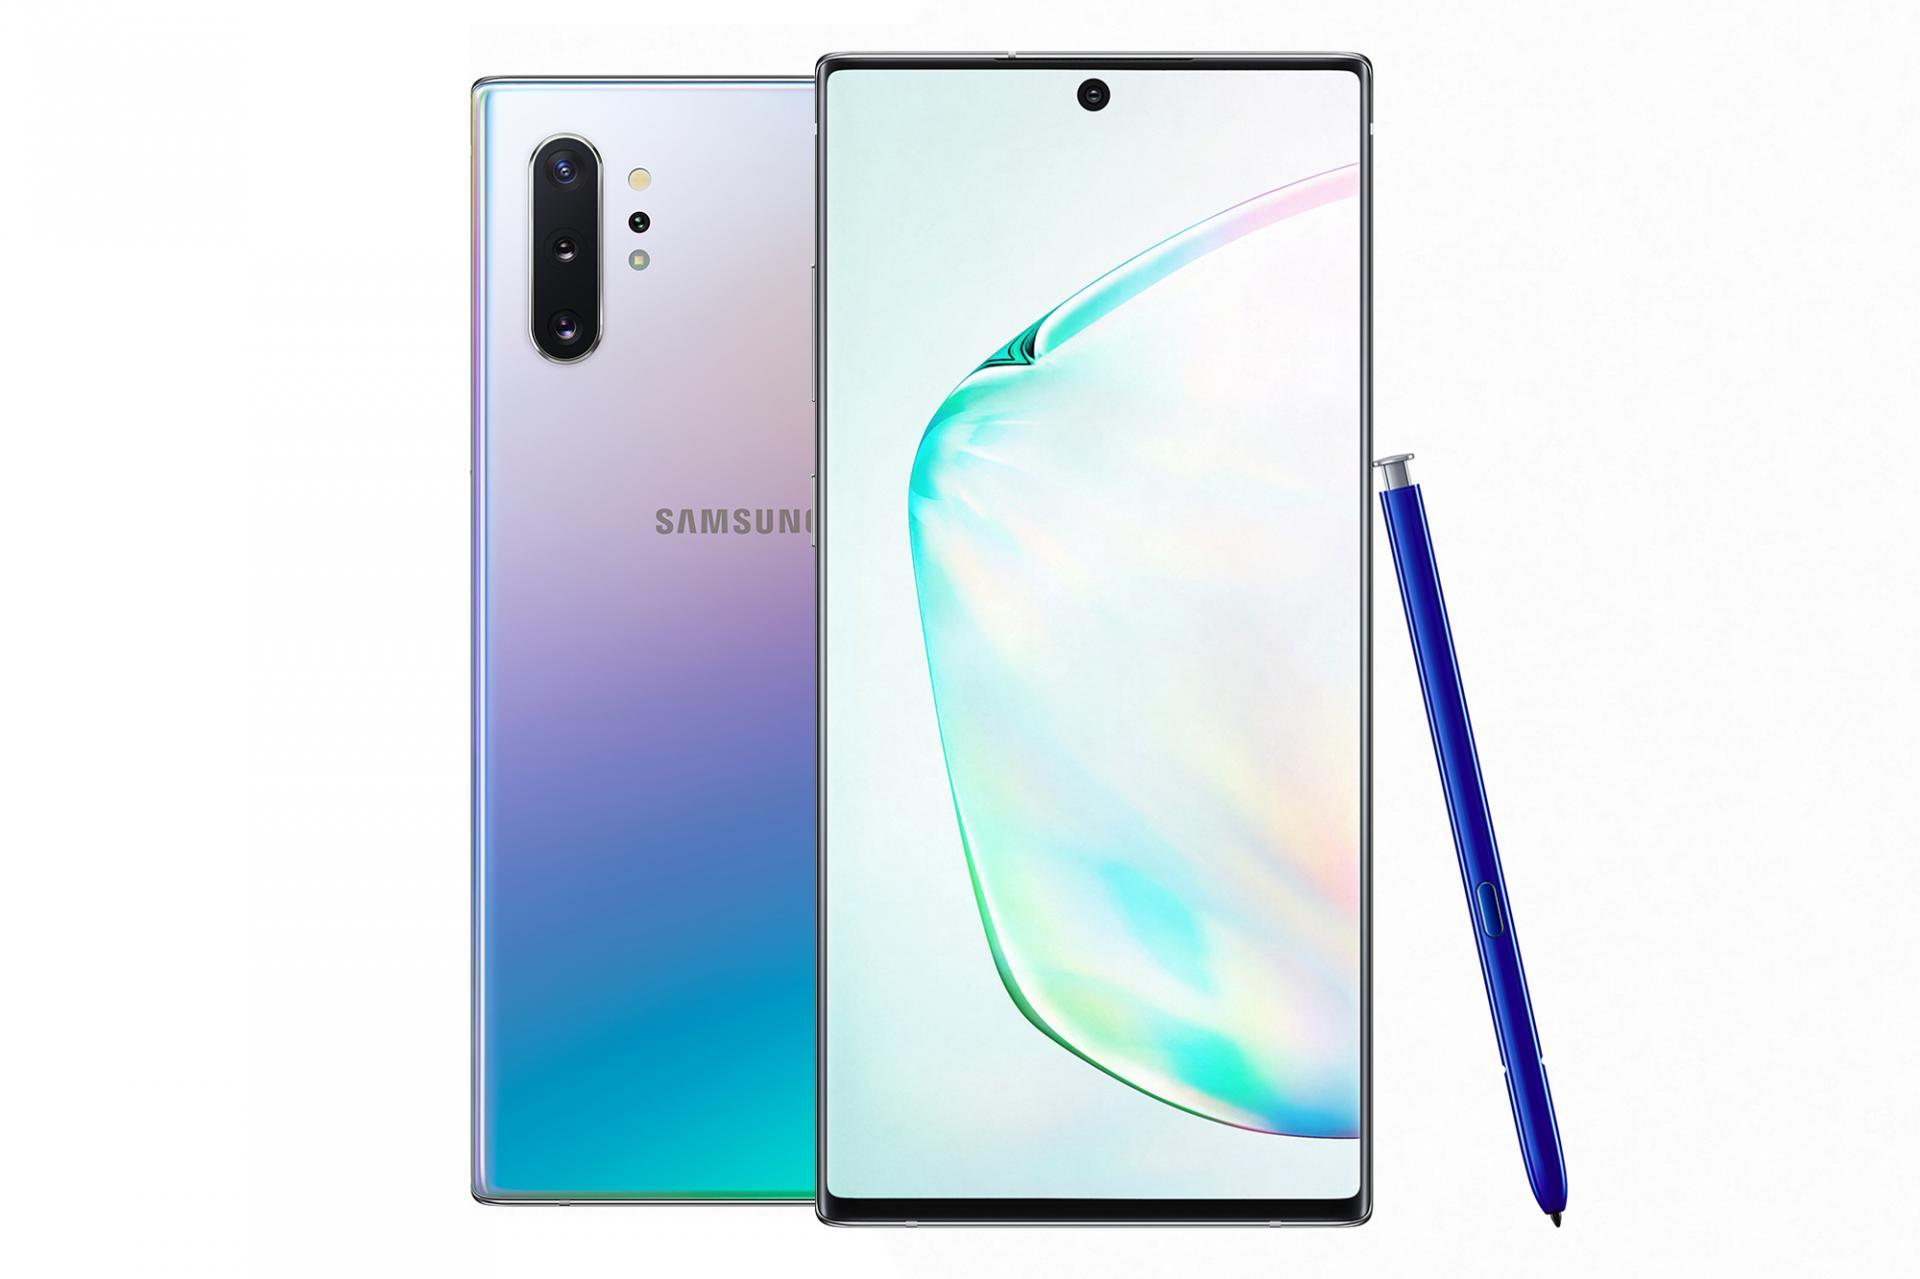 Samsung Galaxy Note пошёл впродажу вРоссии. Берём?